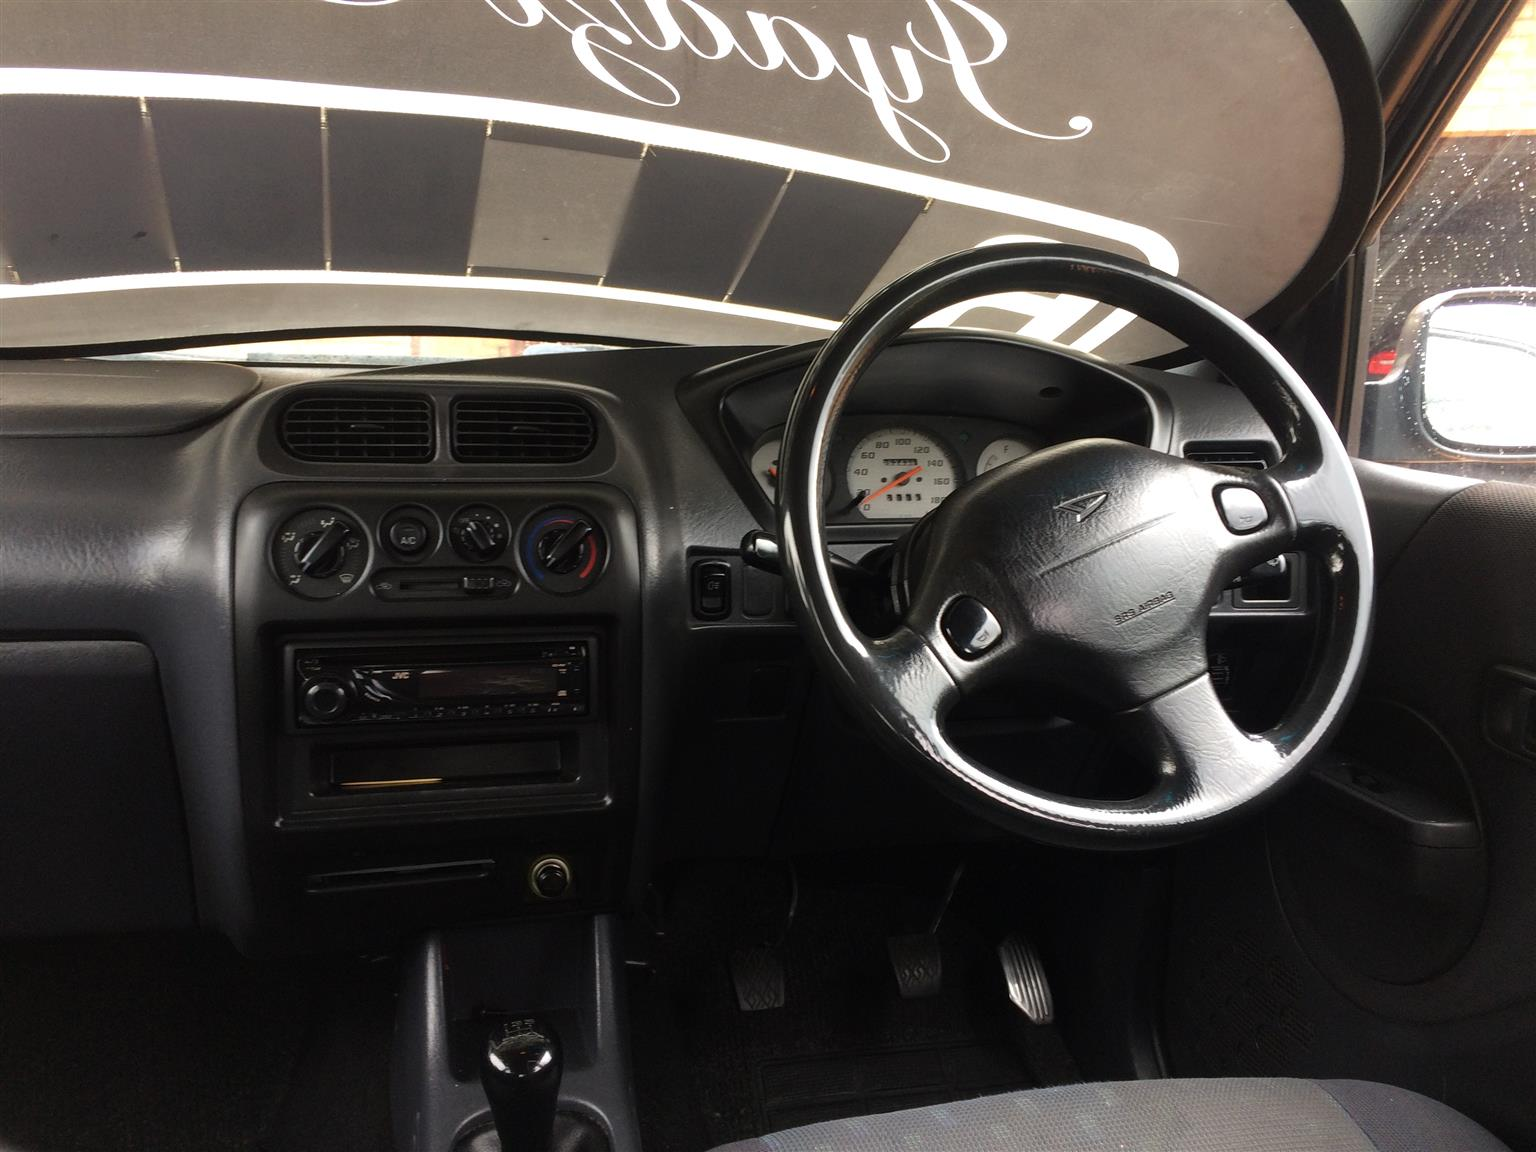 2006 Daihatsu Terios 1.5 4x4